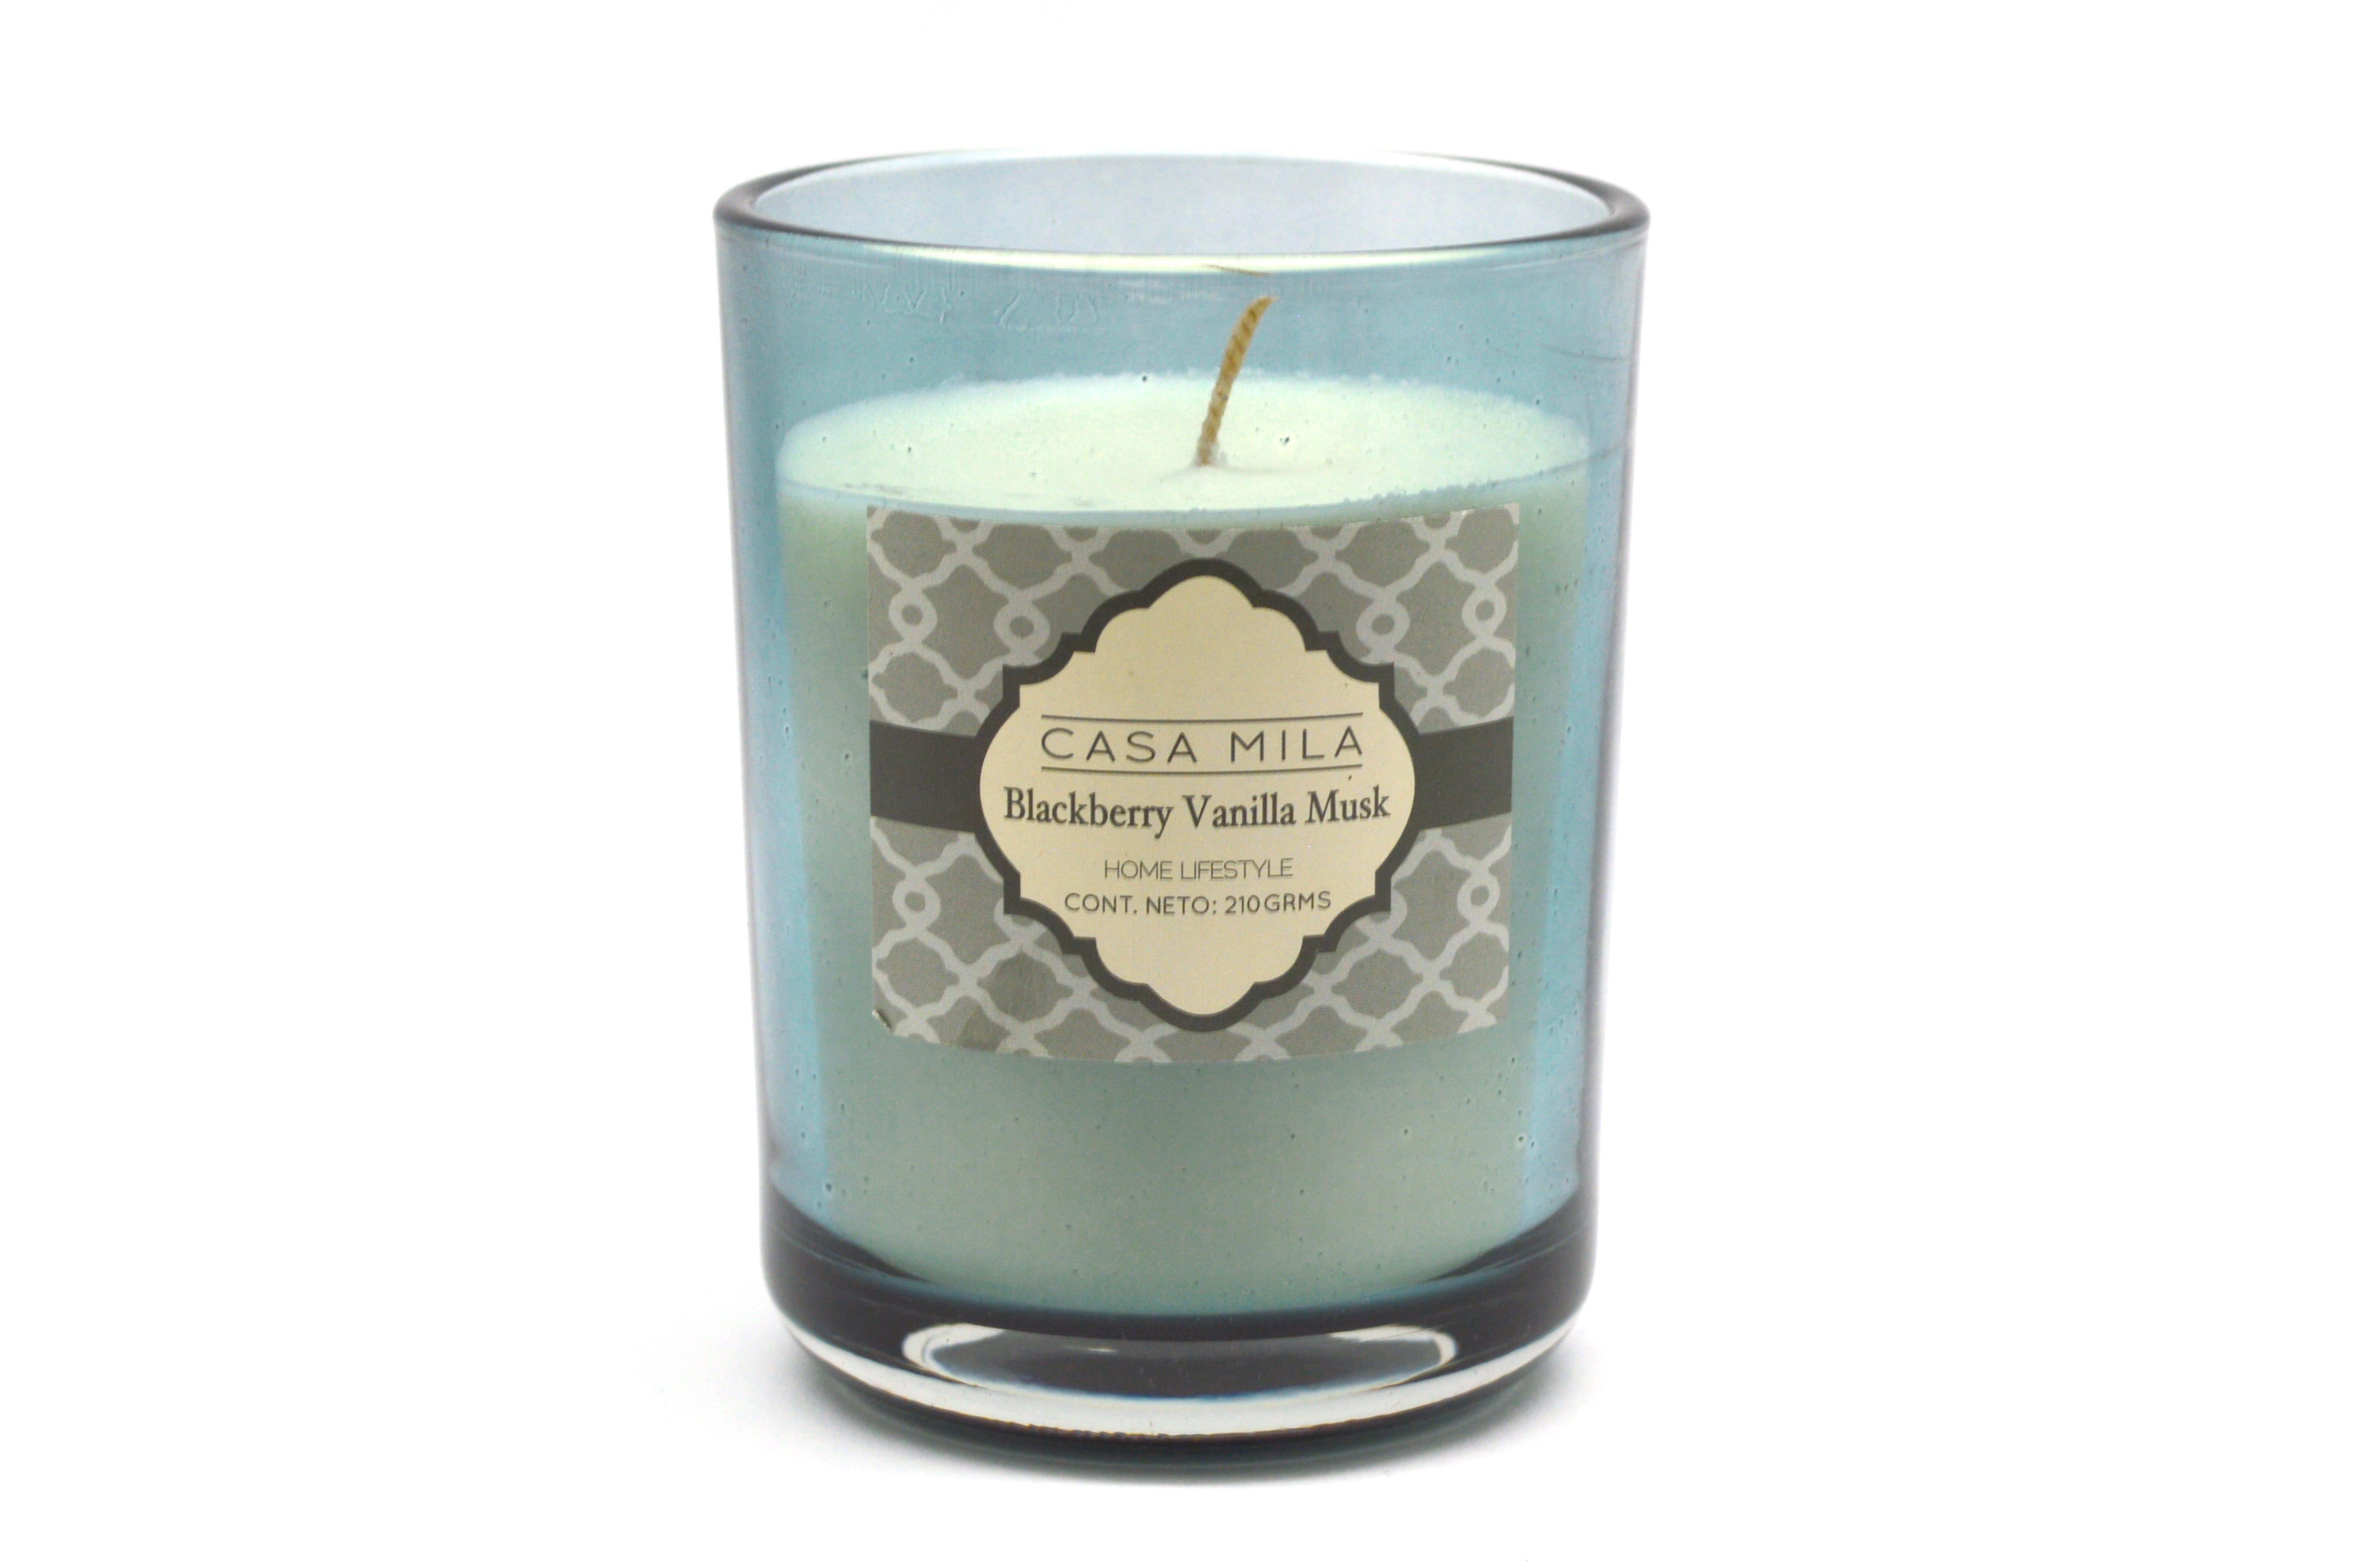 Vela en vaso Casa Mila Home Lifestyle aroma vainilla y moras, 210 g